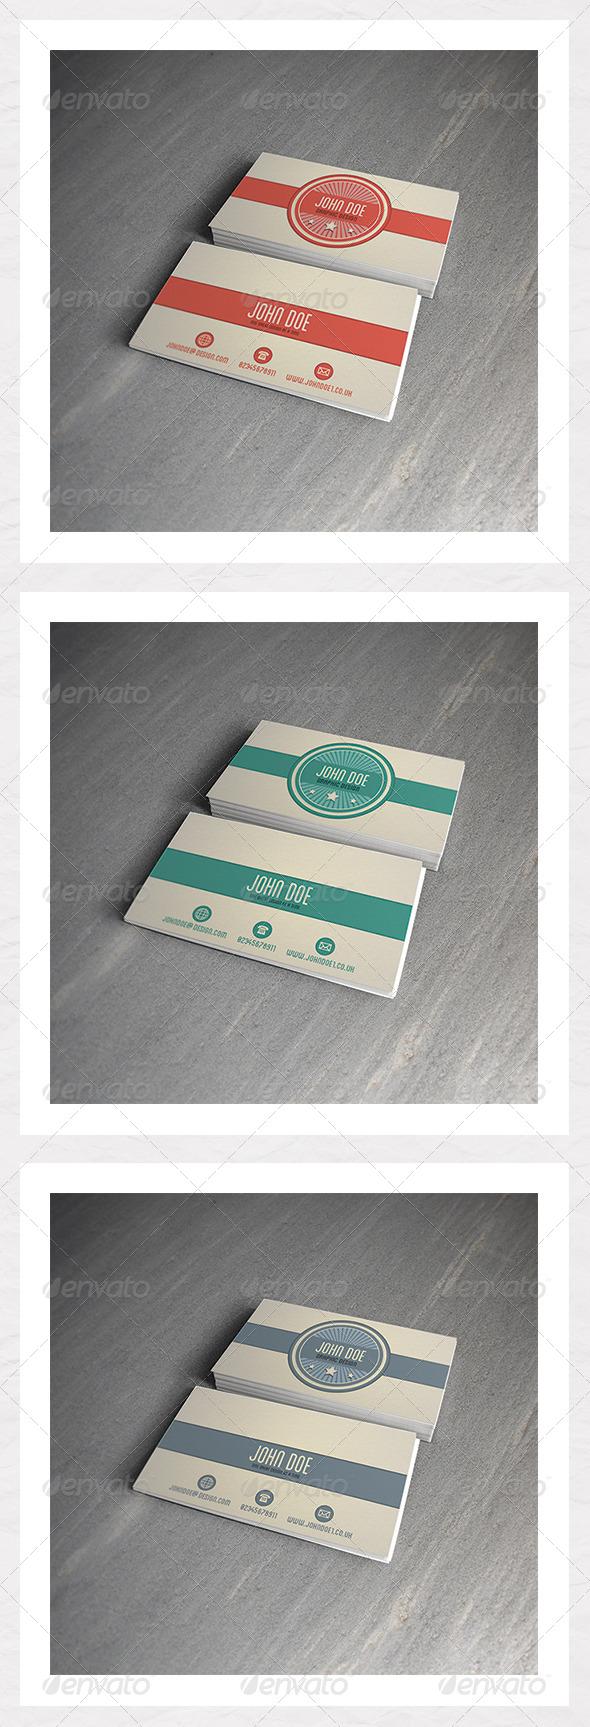 Retro Business Card Template - Retro/Vintage Business Cards